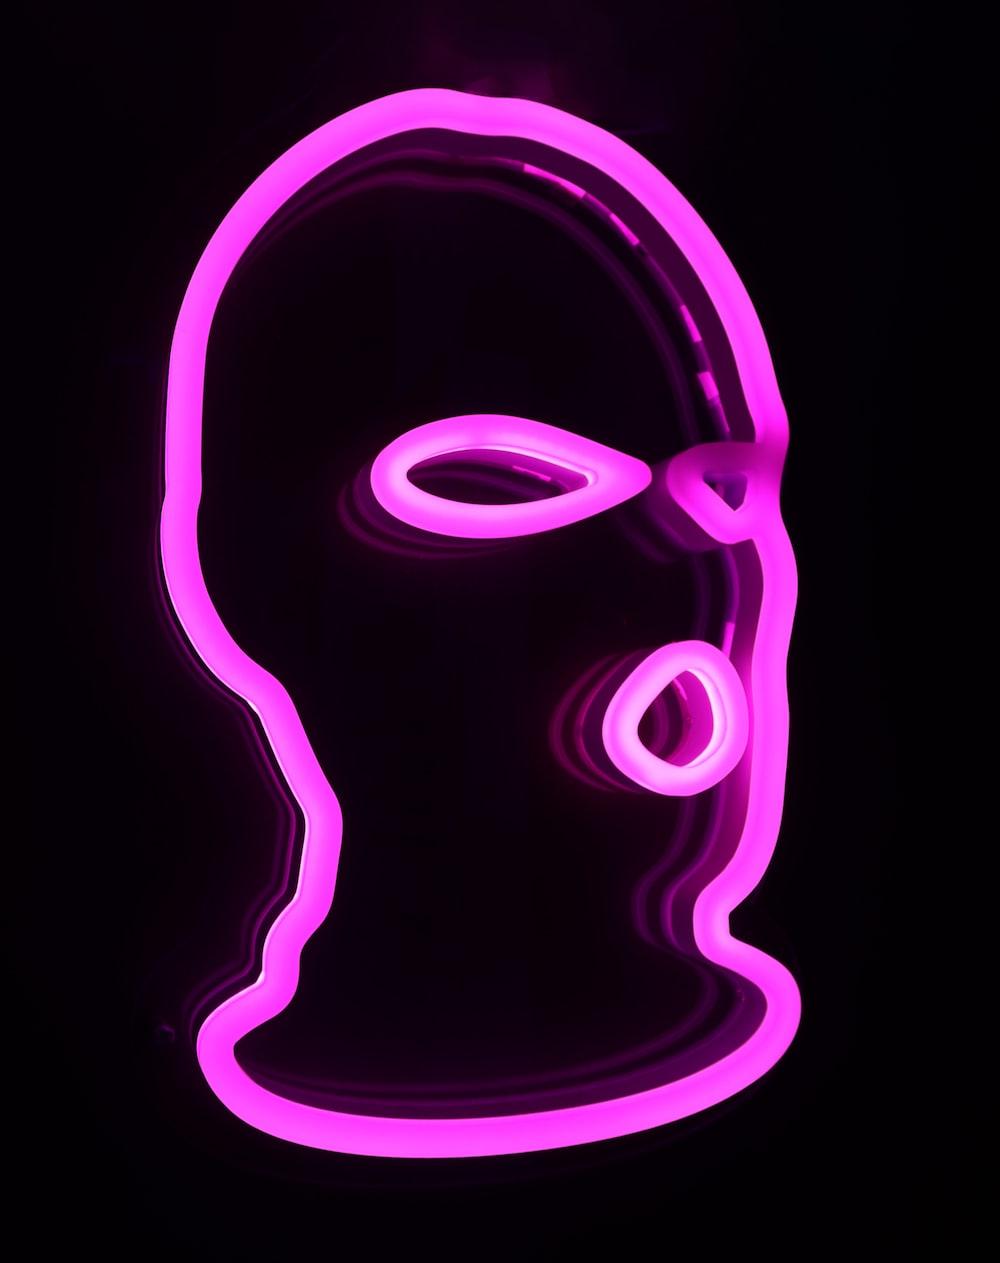 Neon Wallpapers Free Hd Download 500 Hq Unsplash